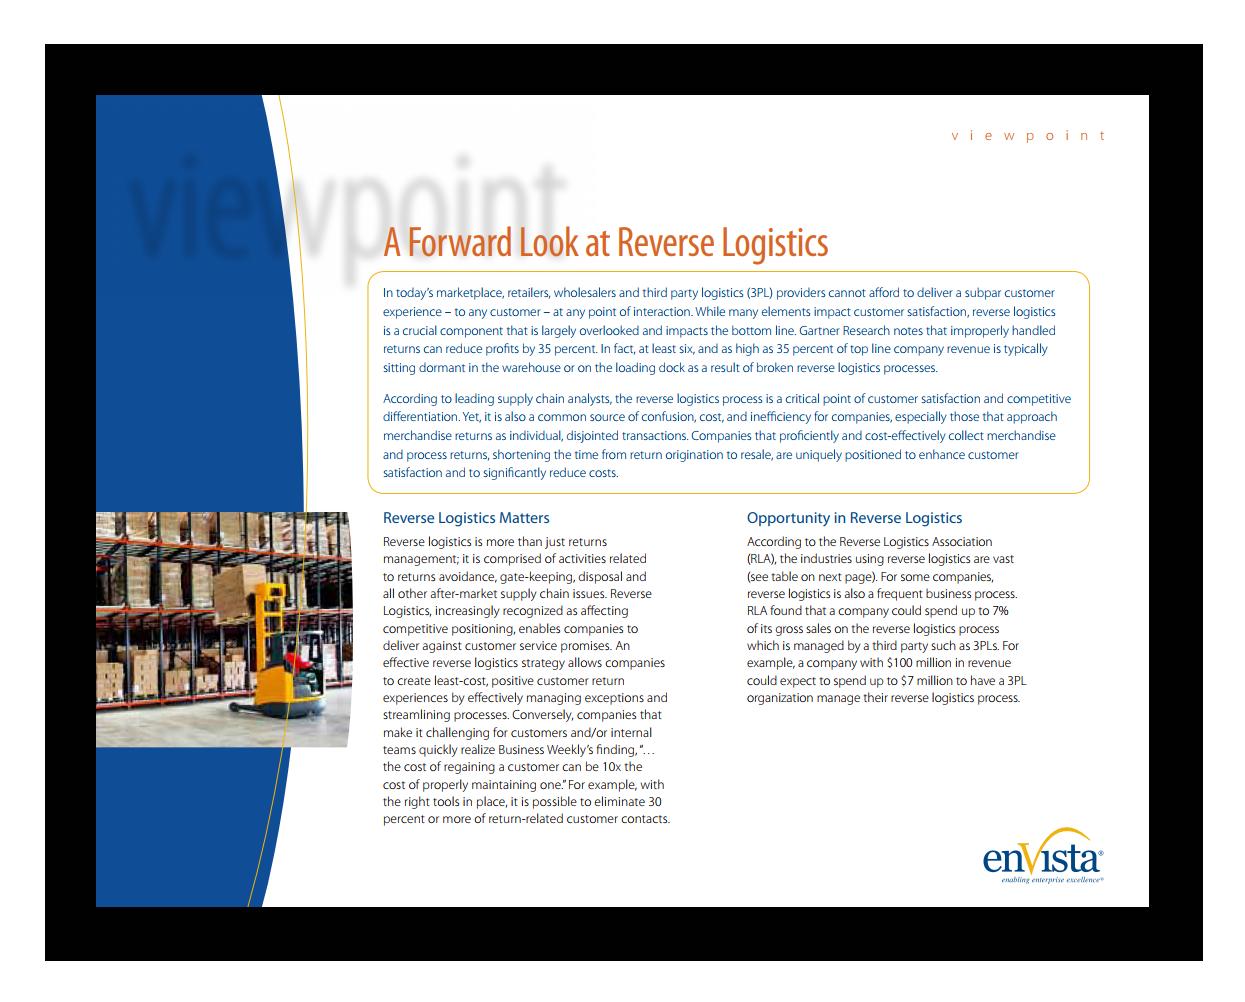 Image_a-forward-look-at-reverse-logistics.png